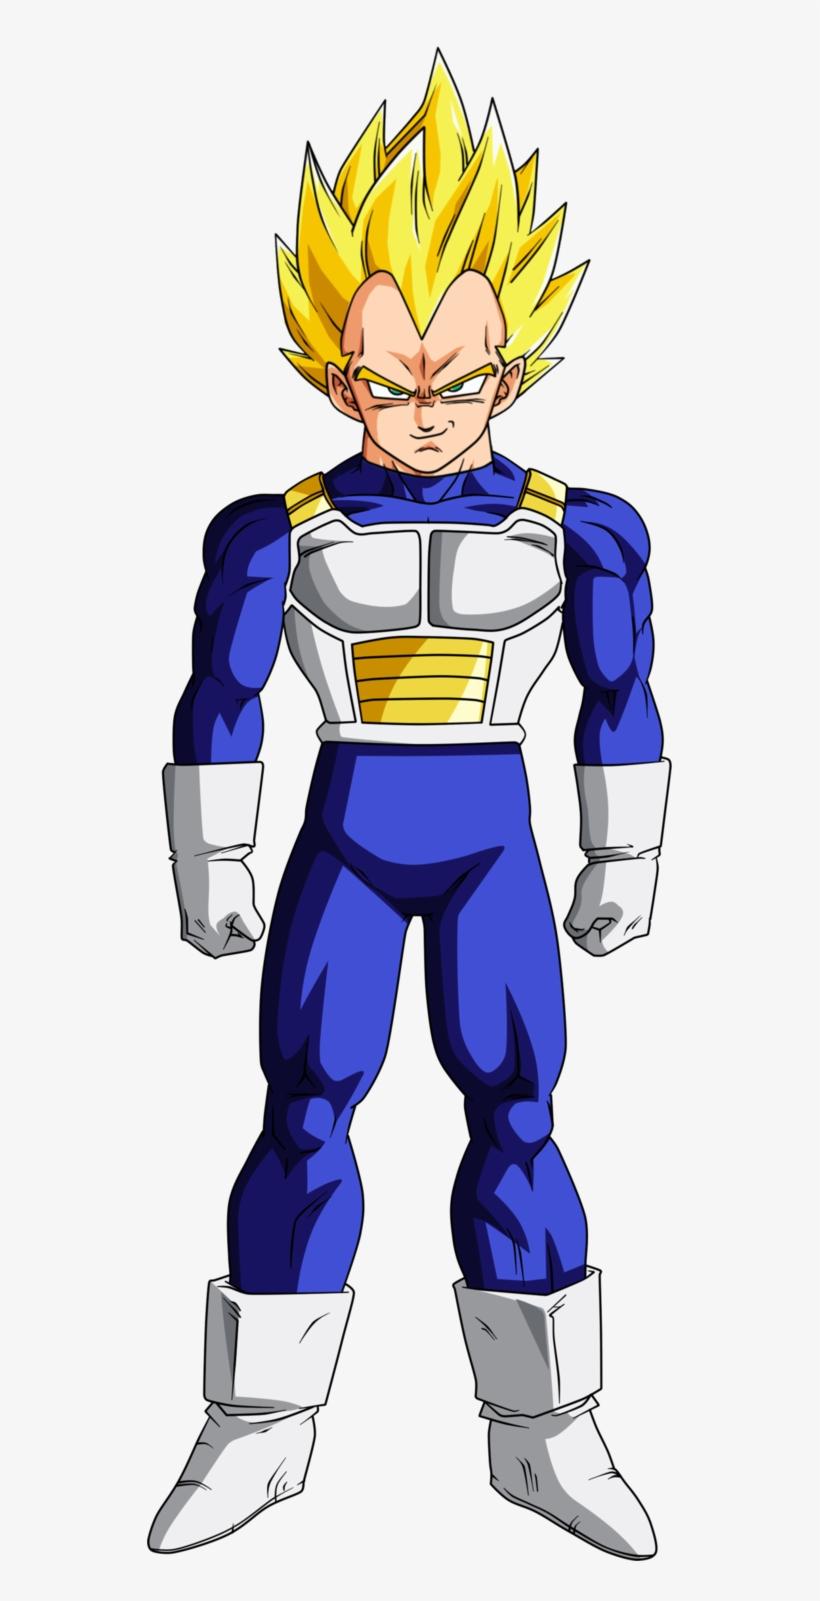 Dragon Ball Z Trunks Super Saiyan 2 - Free Transparent PNG ...